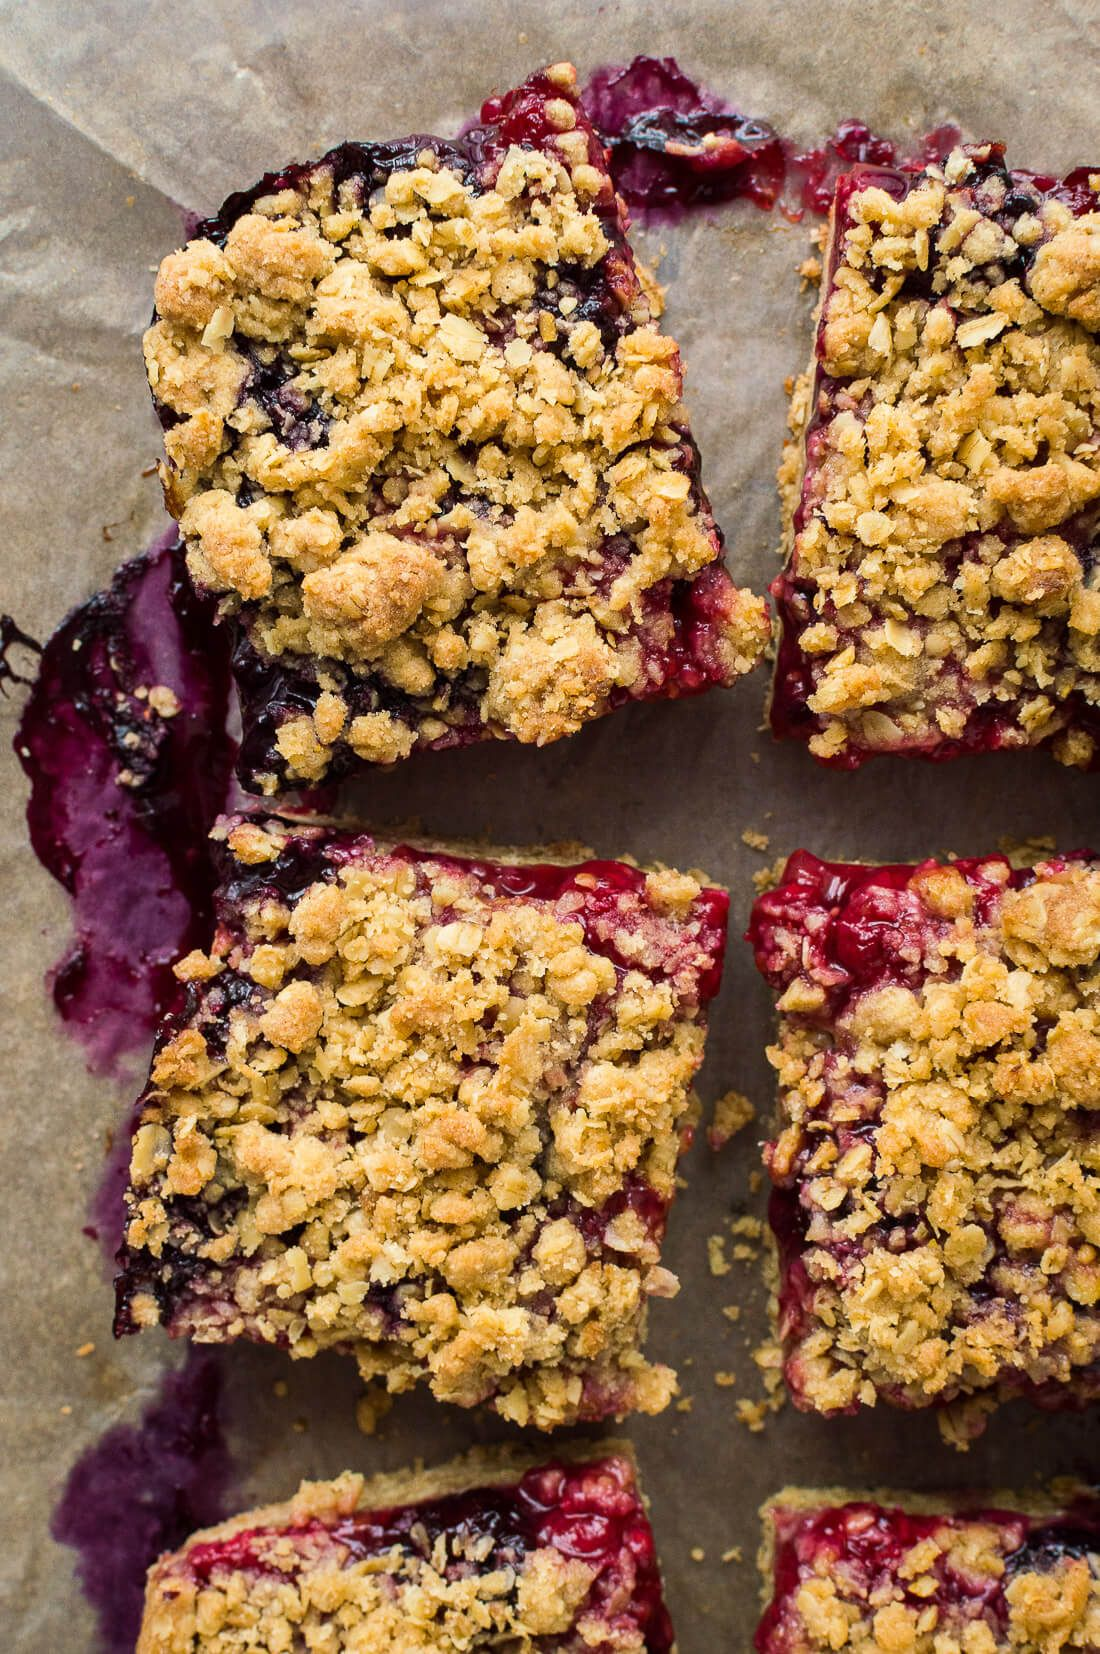 Berry Crumble Bars (Vegan) - Domestic Gothess